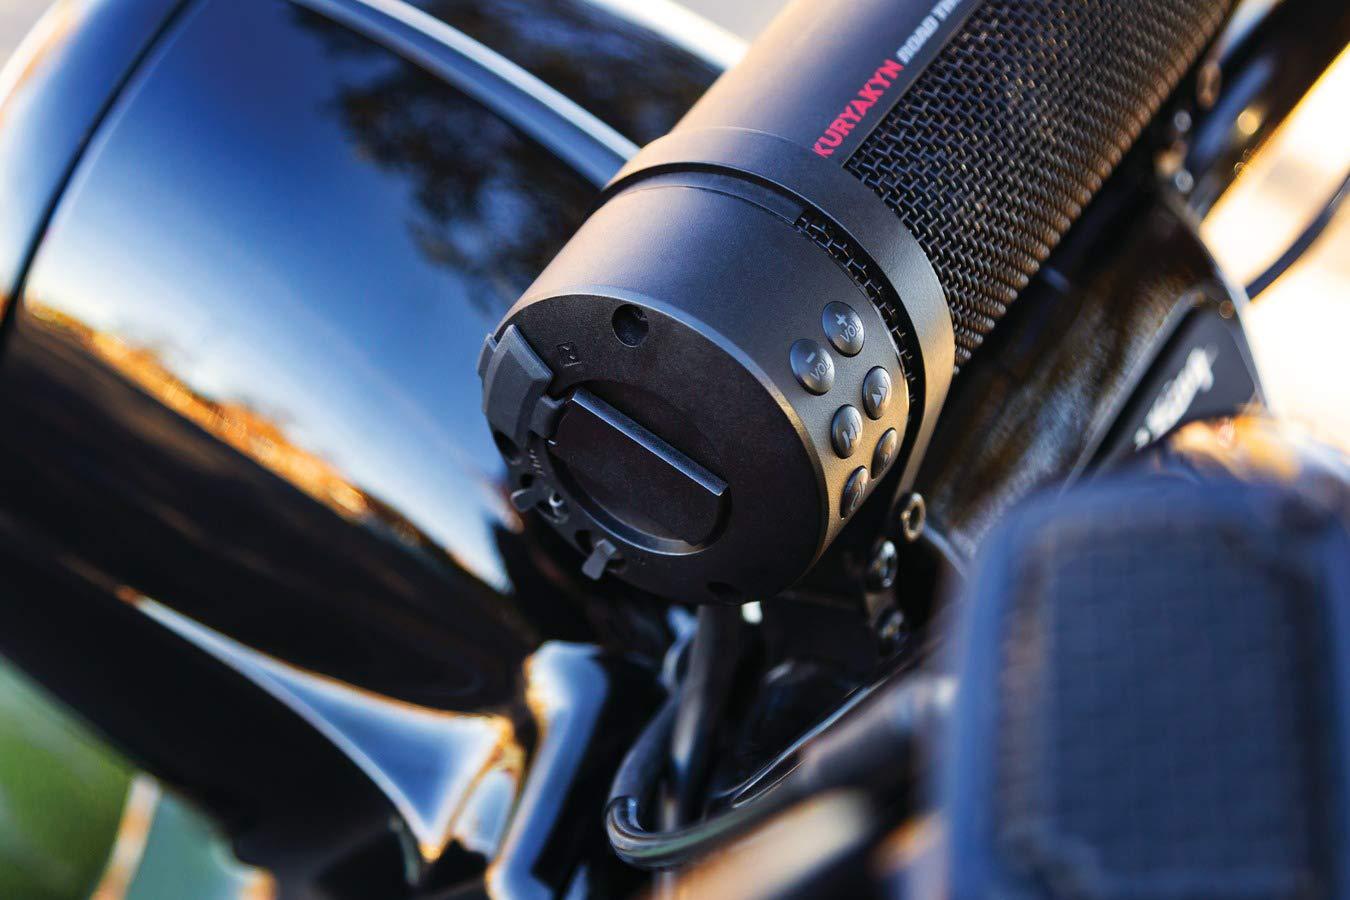 USB Power Charger Kuryakyn 2720 MTX Road Thunder Weather Resistant Motorcycle Sound Bar Plus 300 Watt Handlebar Mounted Audio Speakers with Bluetooth Satin Black